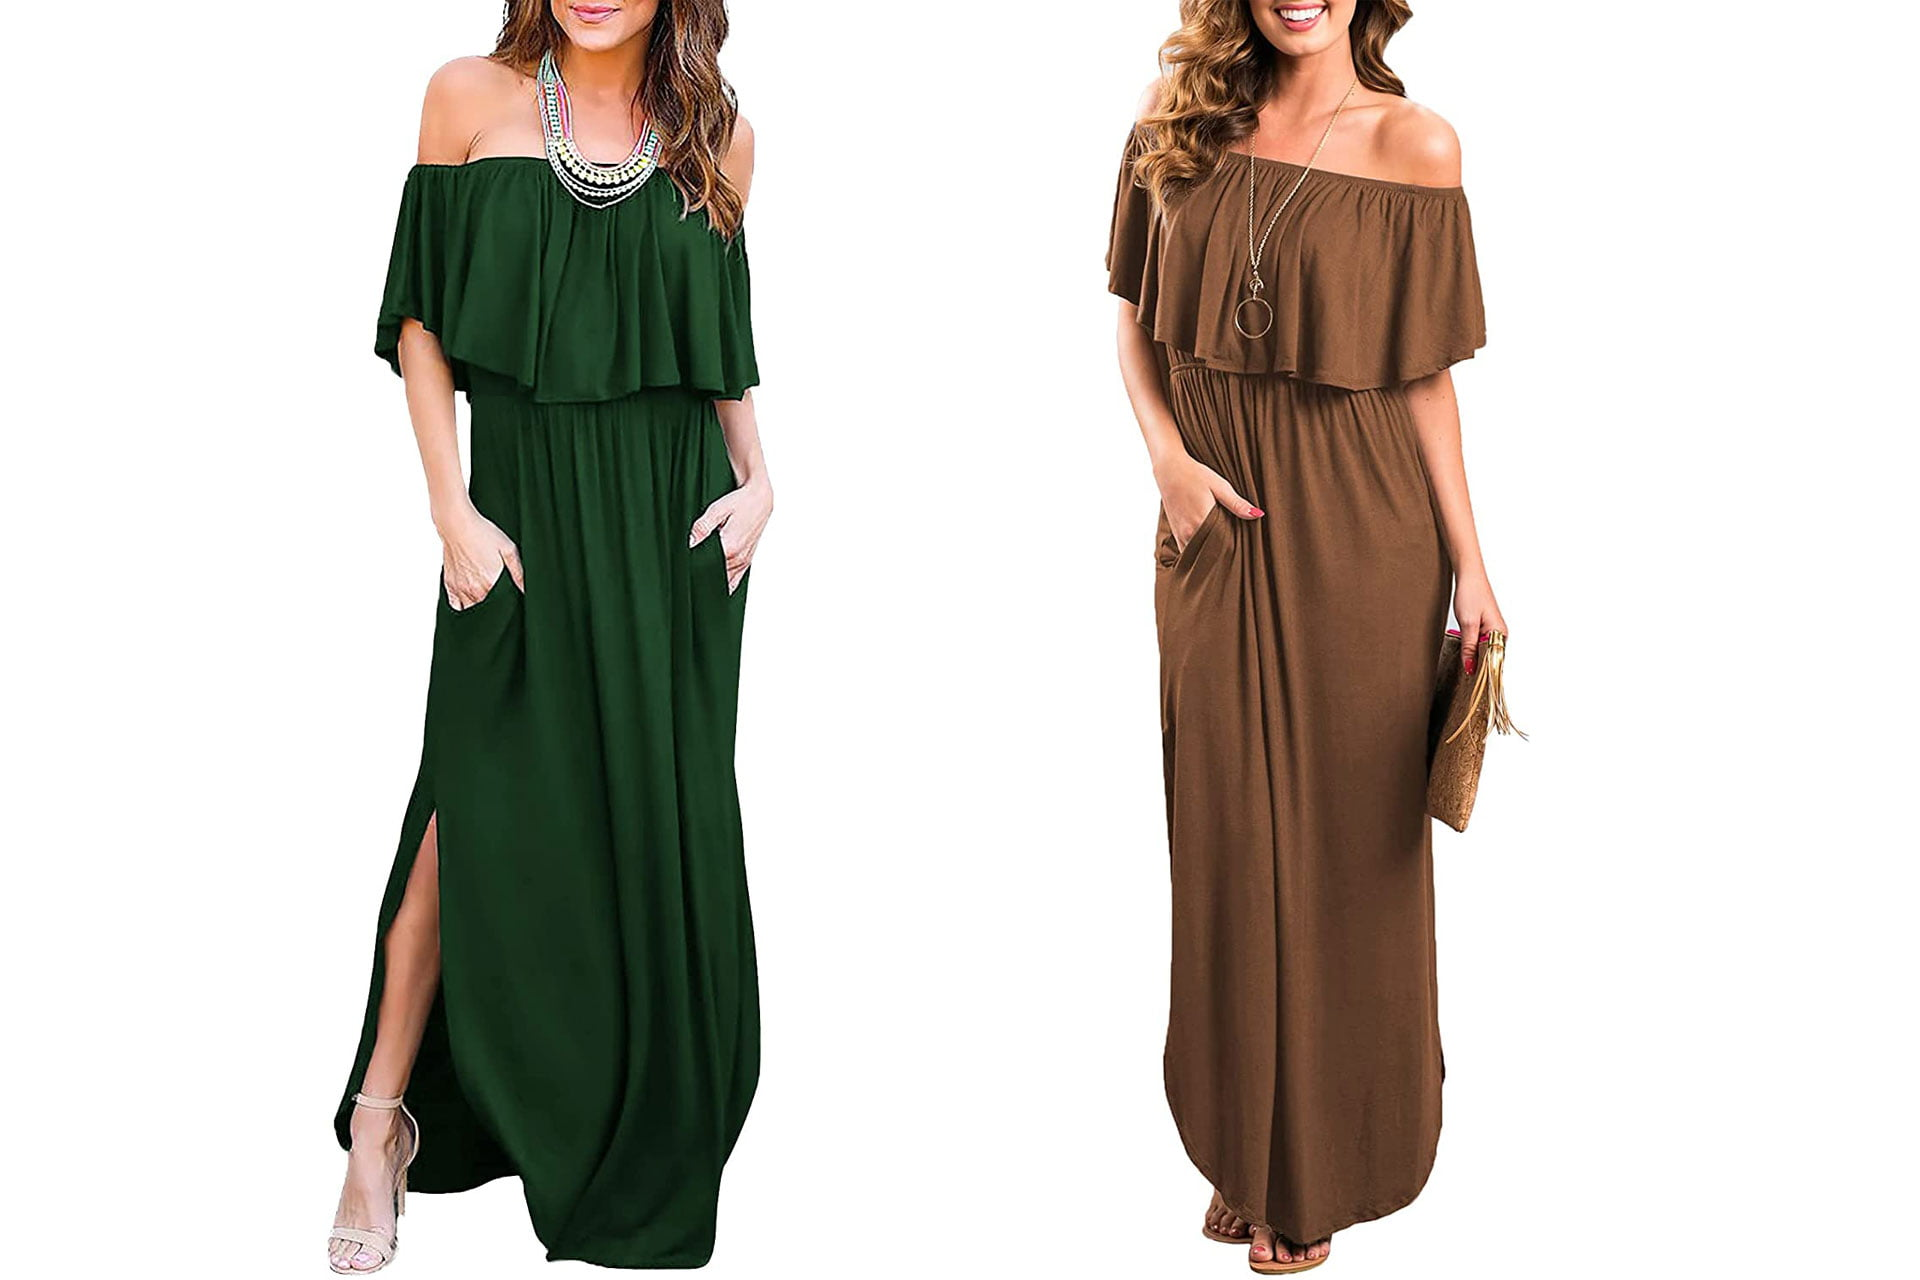 Women's Off The Shoulder Ruffle Party Dresses Side Split Beach Maxi Dress